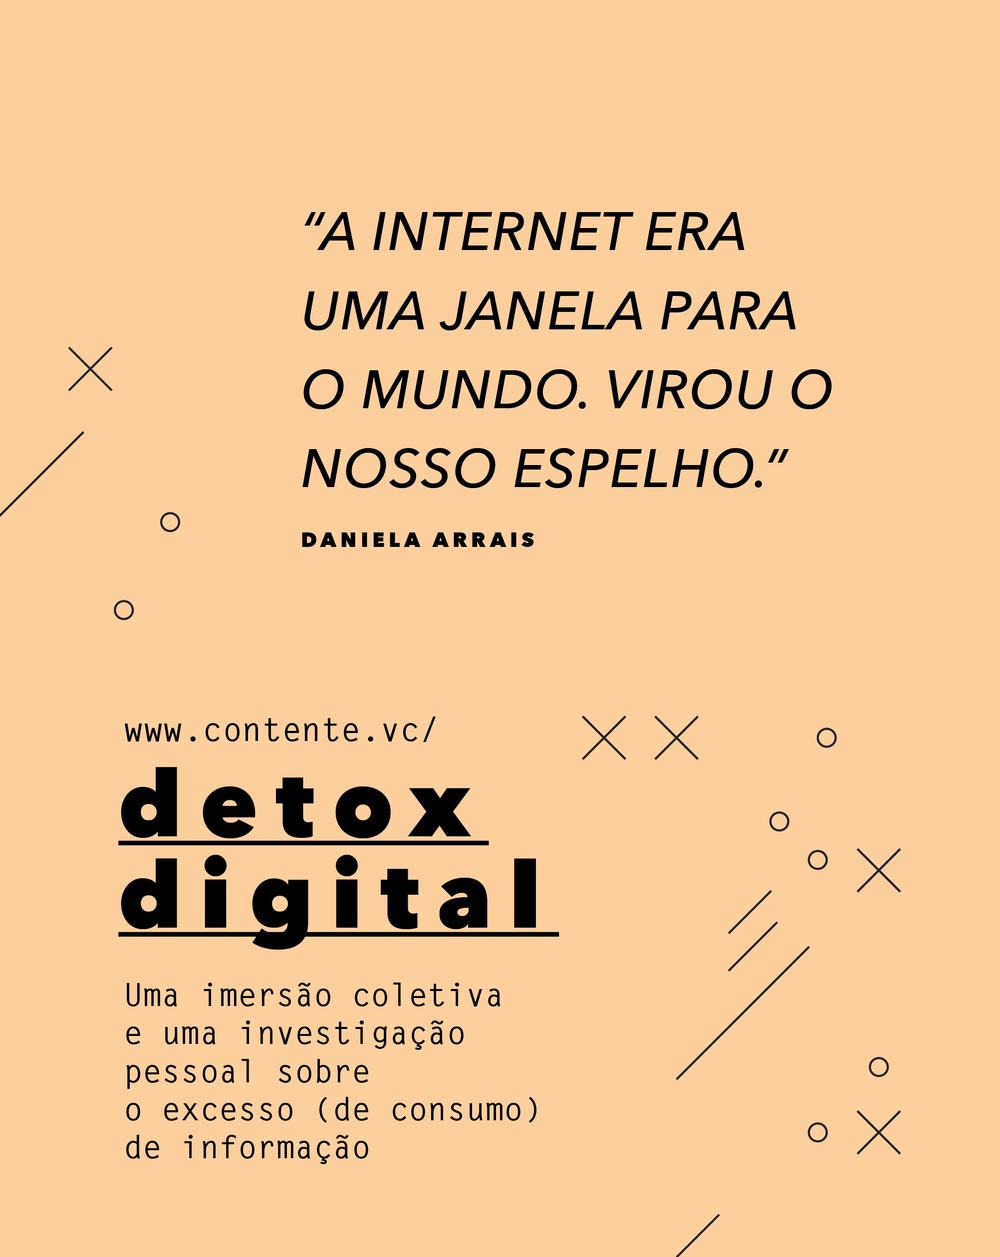 dettoxdigital-02.png